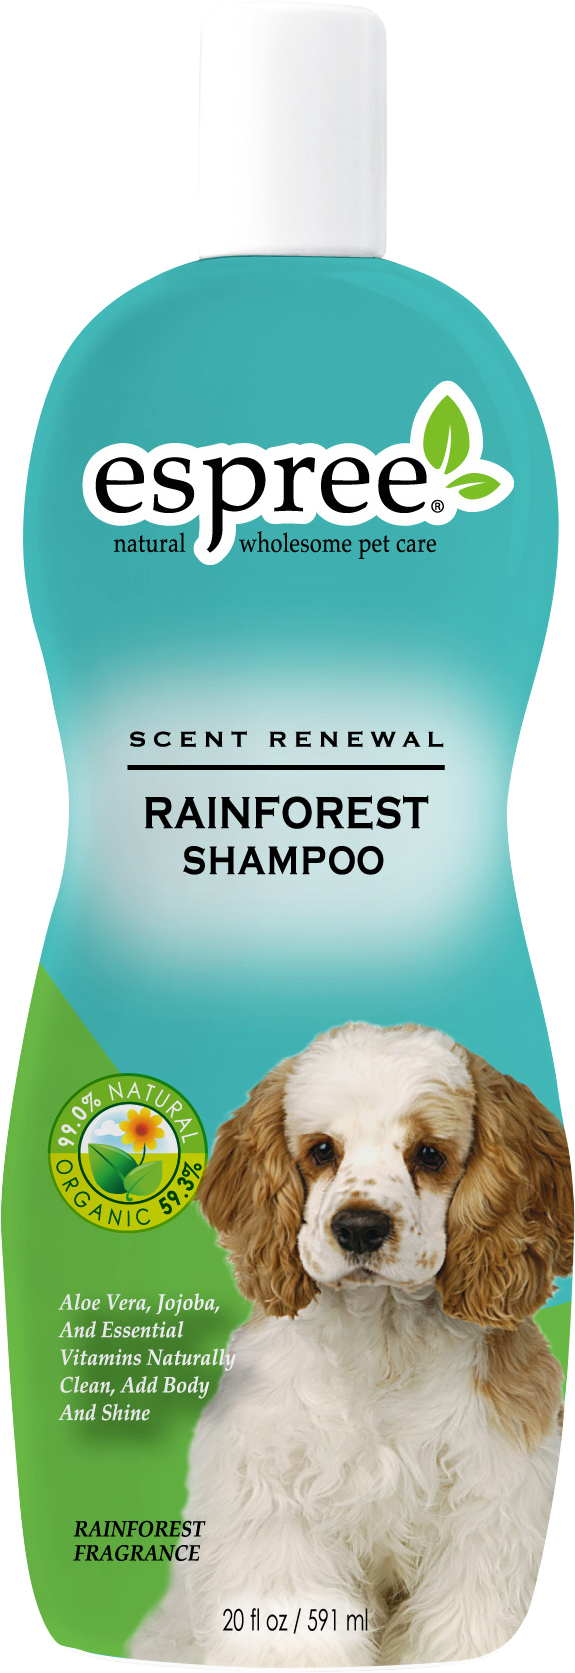 Hundschampo Espree Rainforest, 355 ml